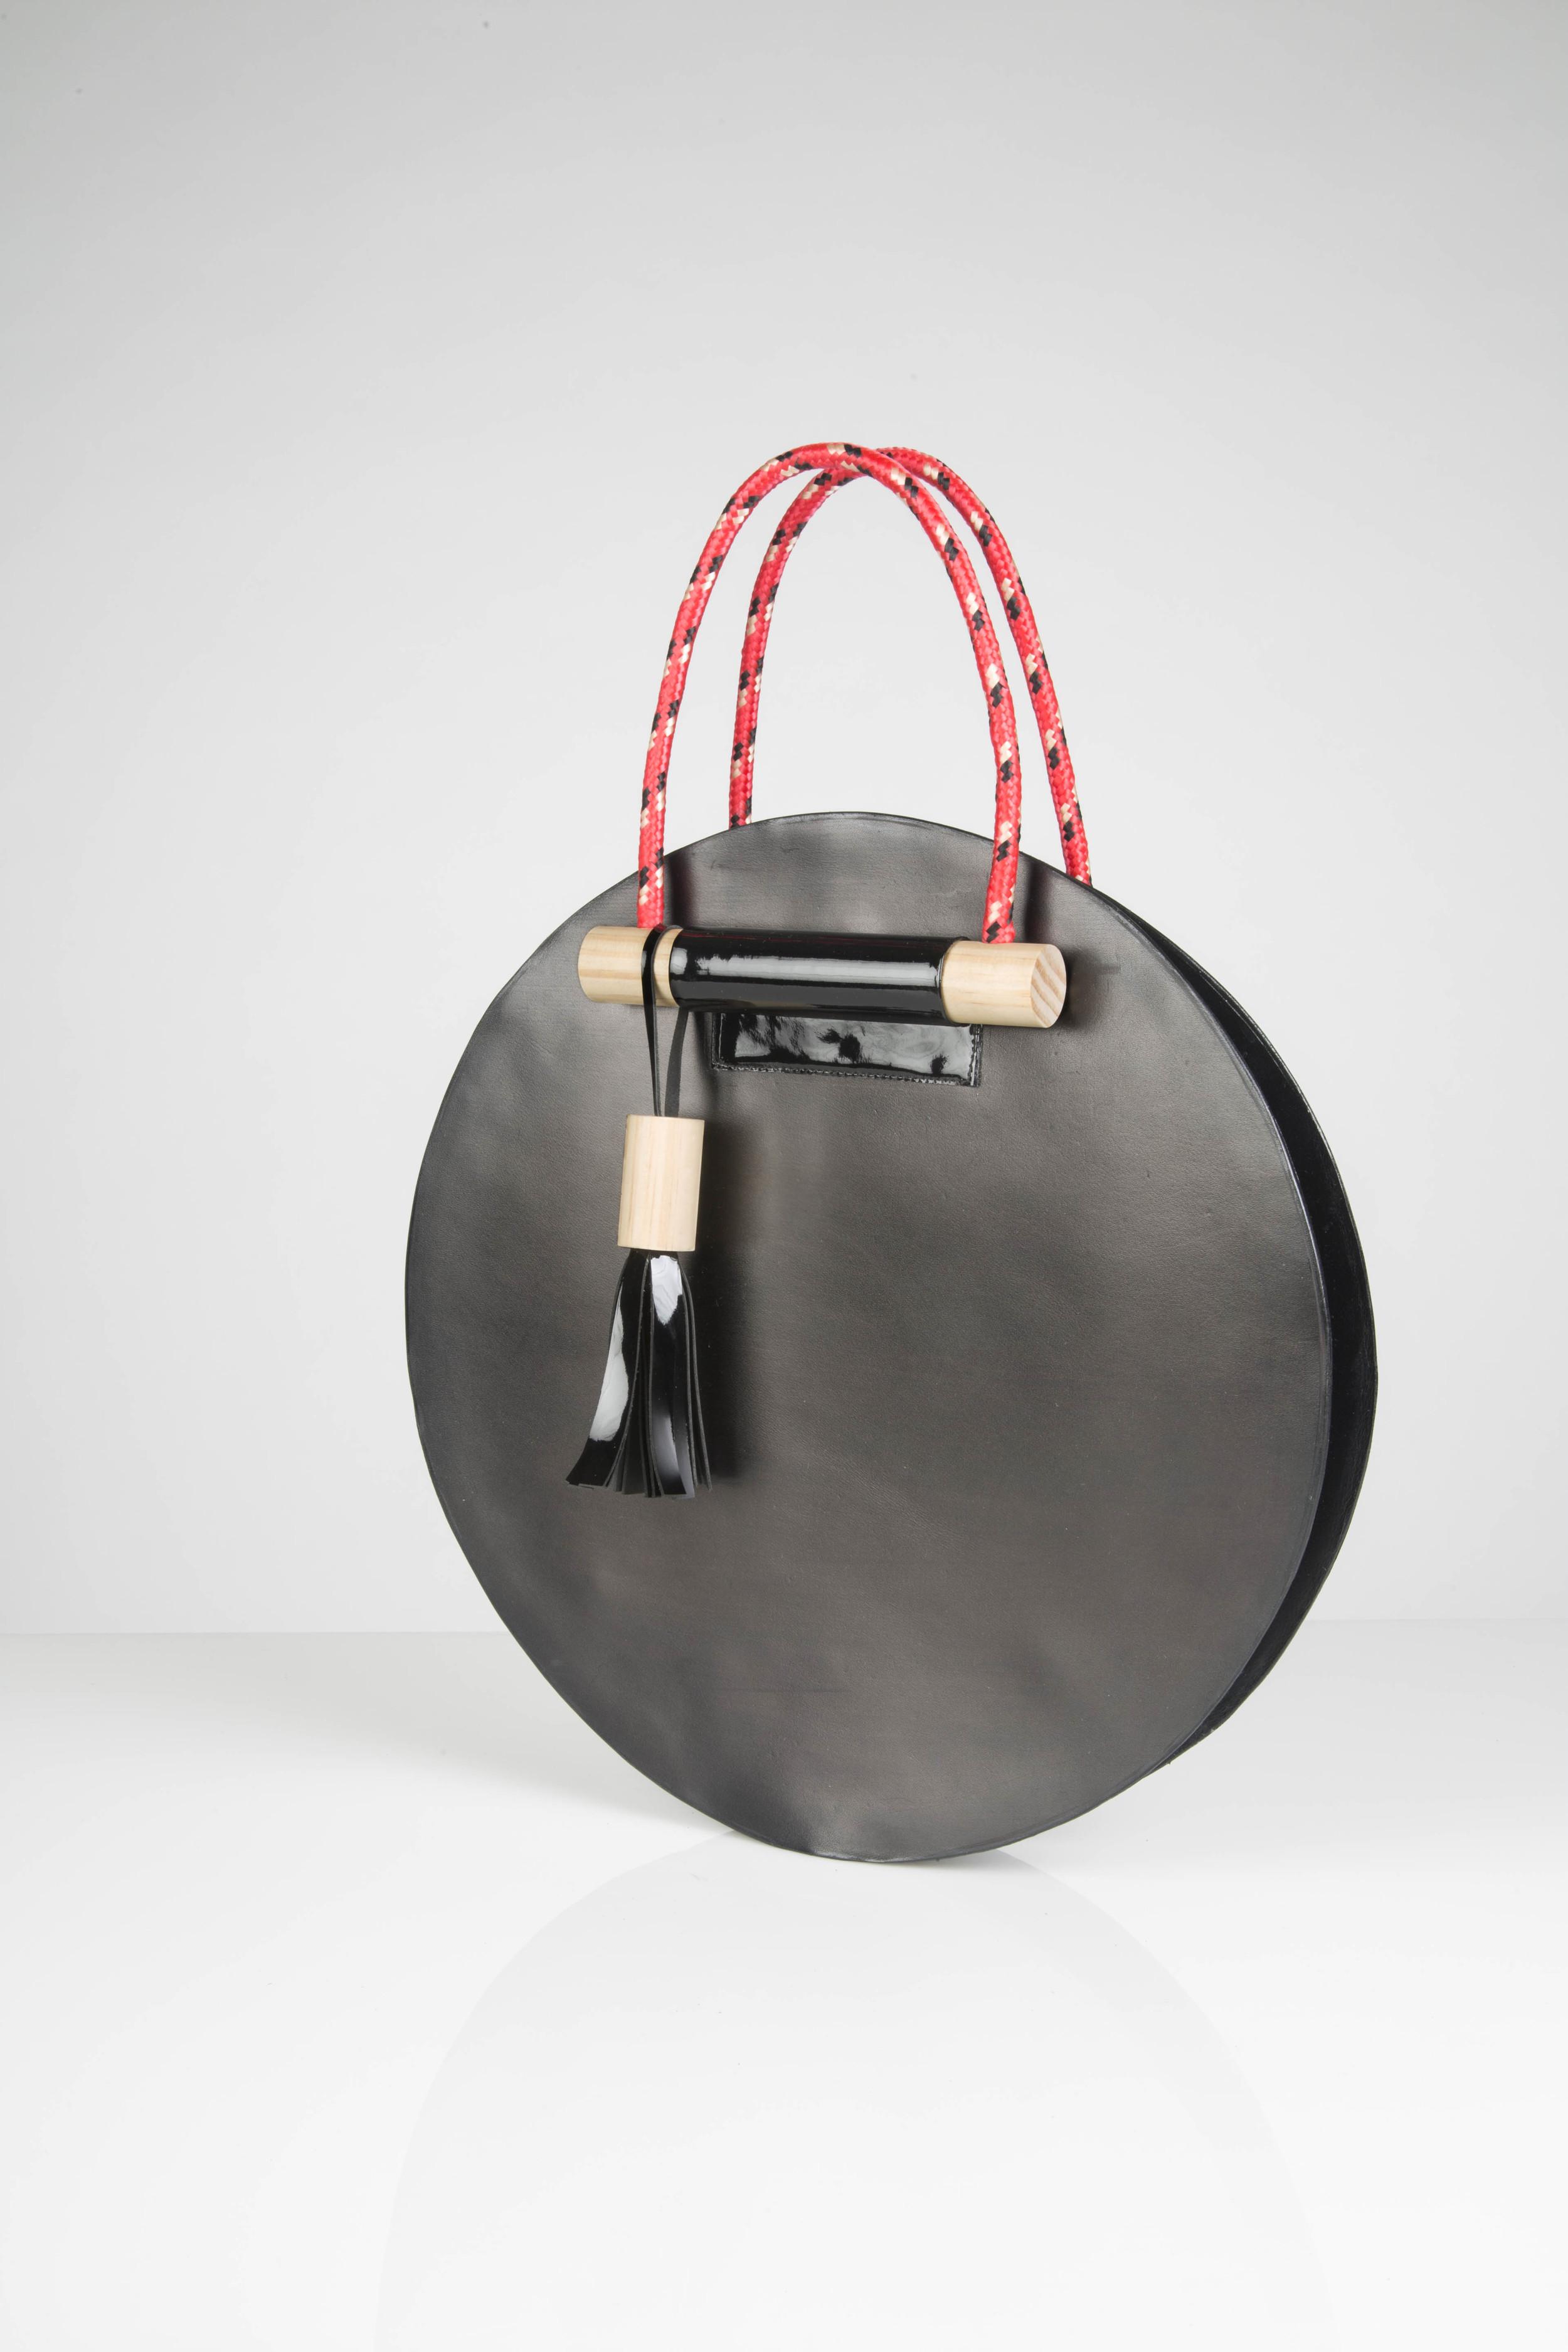 LITERALLYHandbags-10.jpg